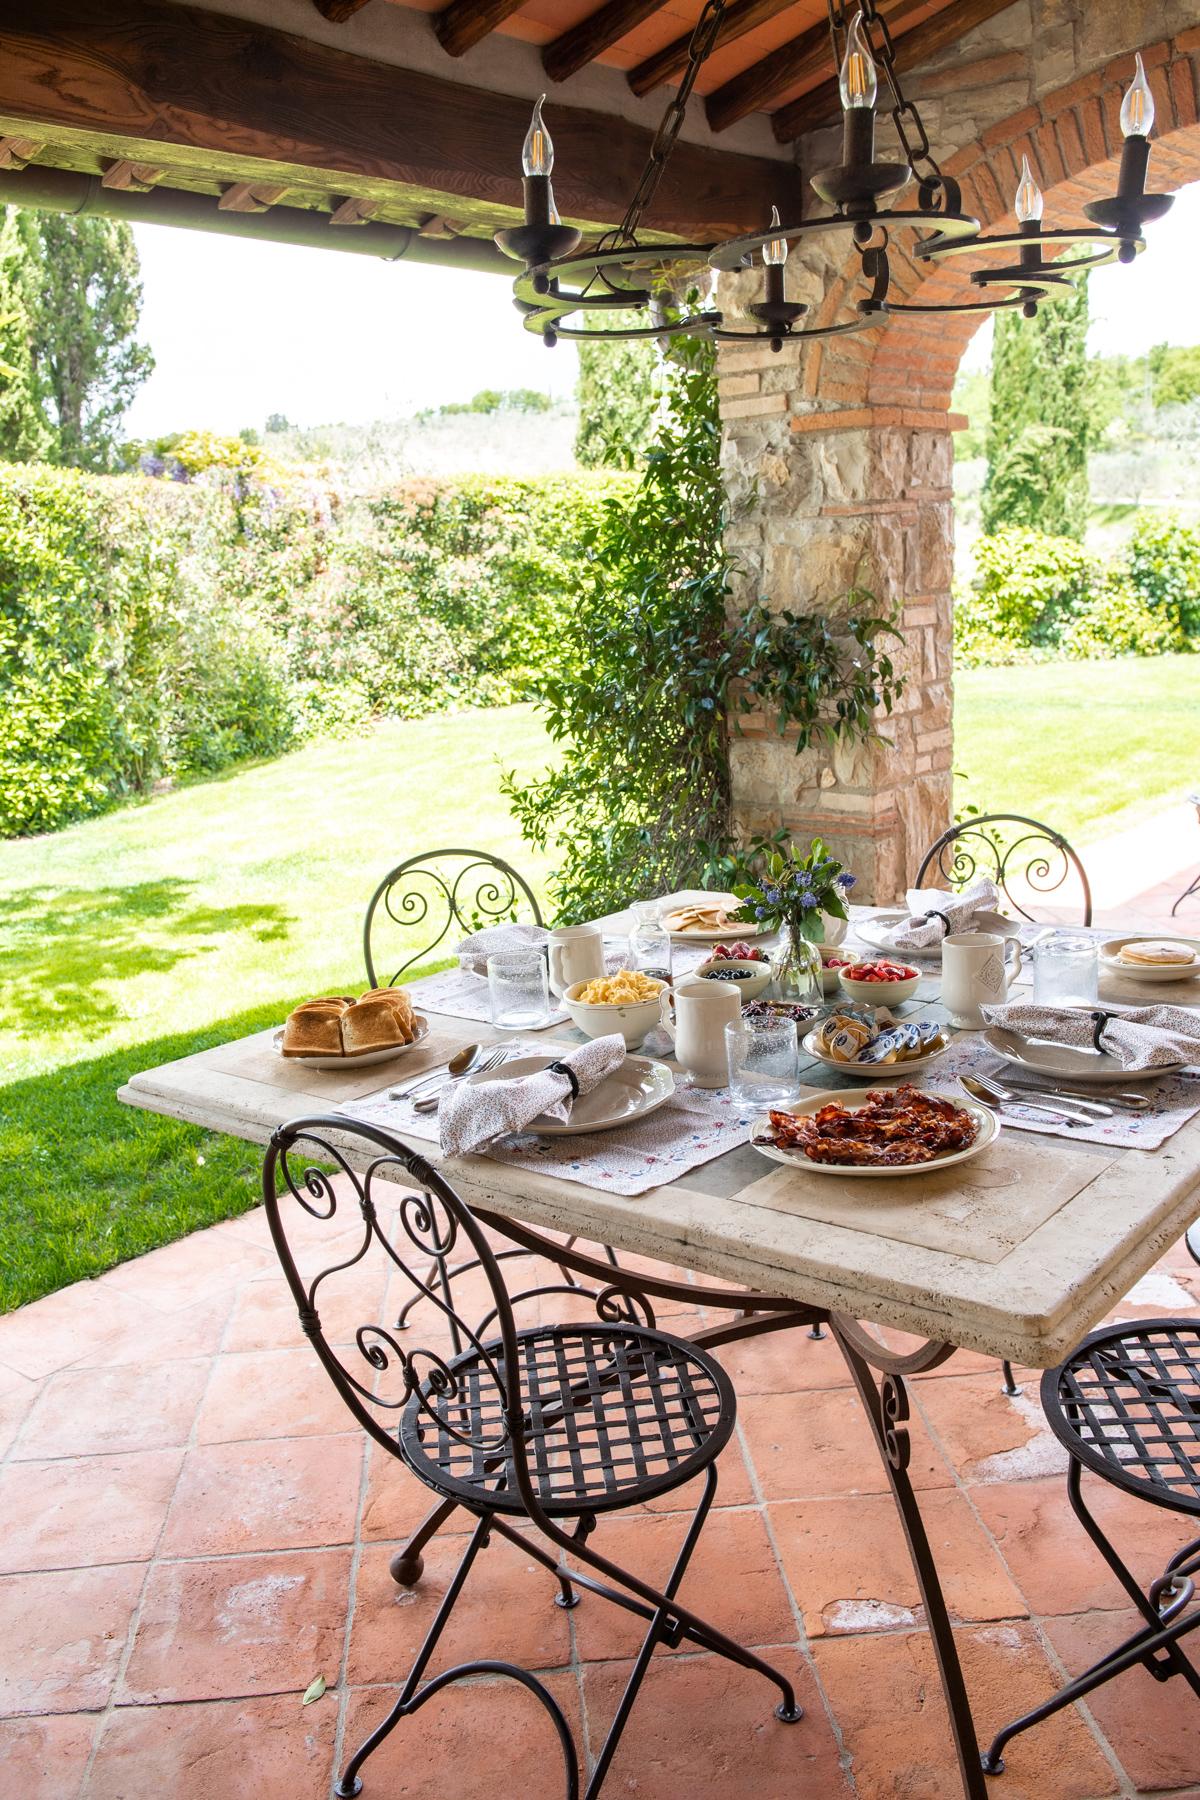 Stacie Flinner x Cuvee Tuscan Farmhouse Villa Tuscany Italy Guide-2.jpg